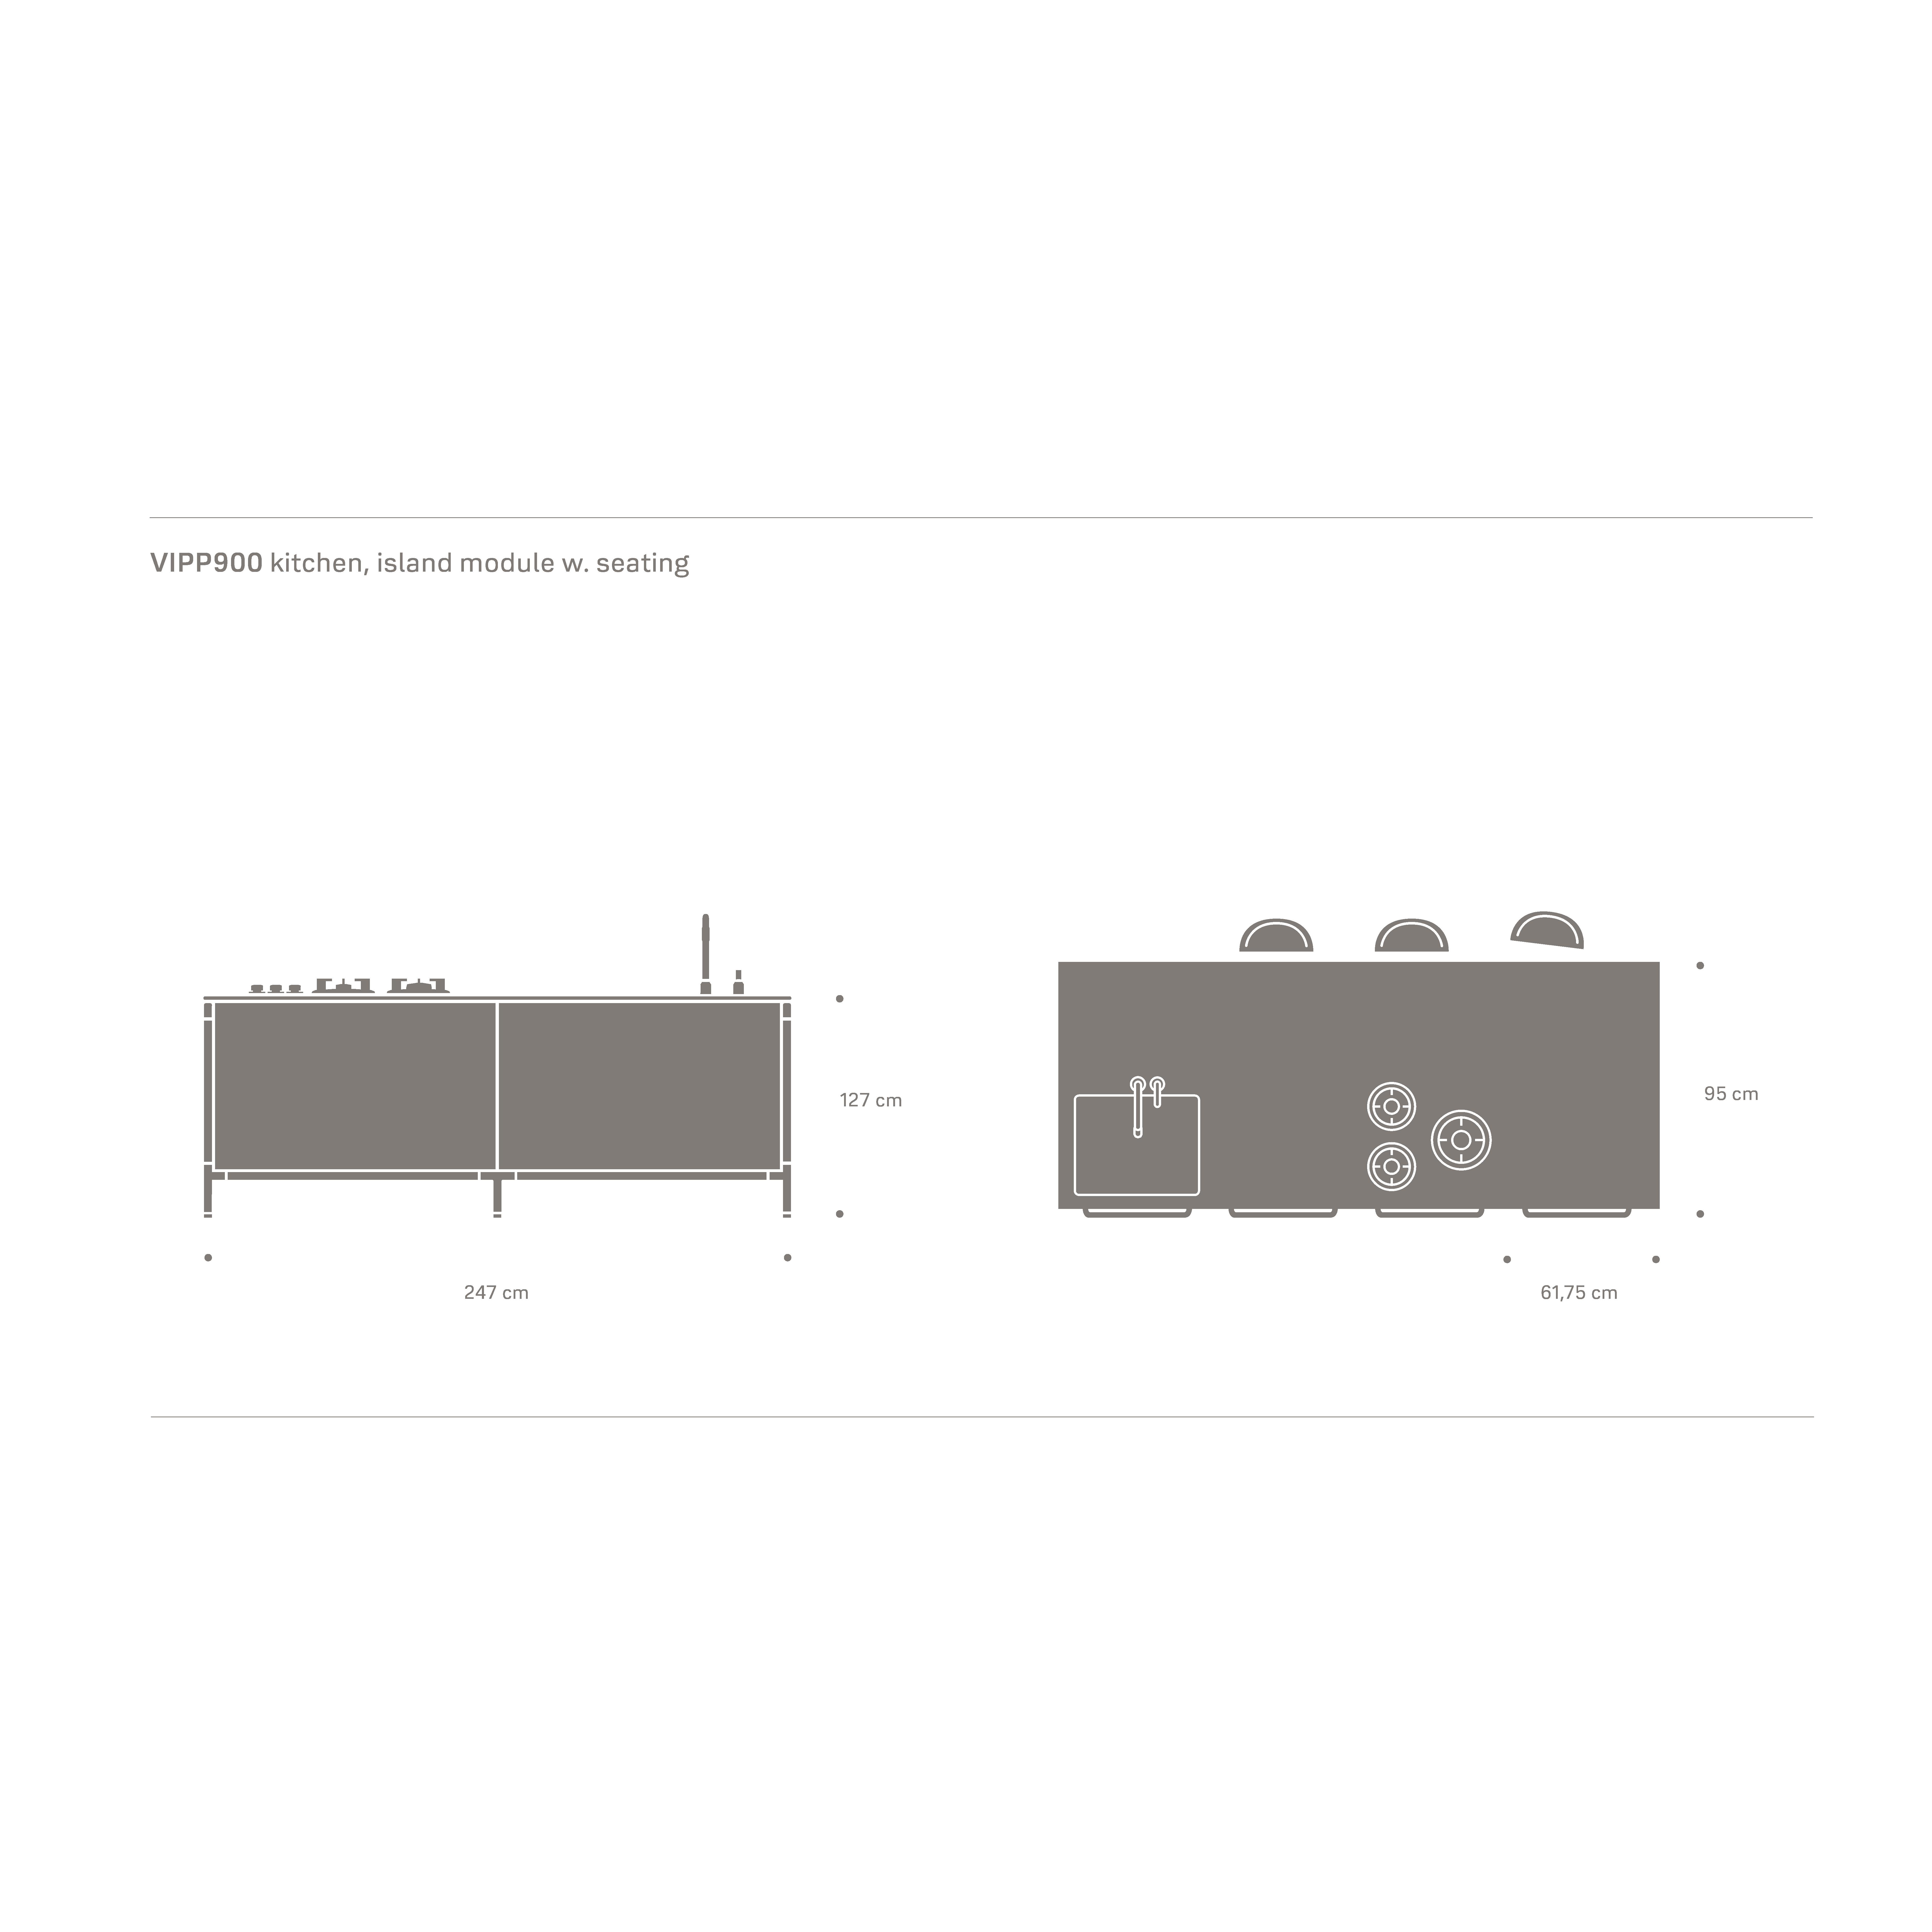 Technische Angaben zum Inselmodul | vipp.com